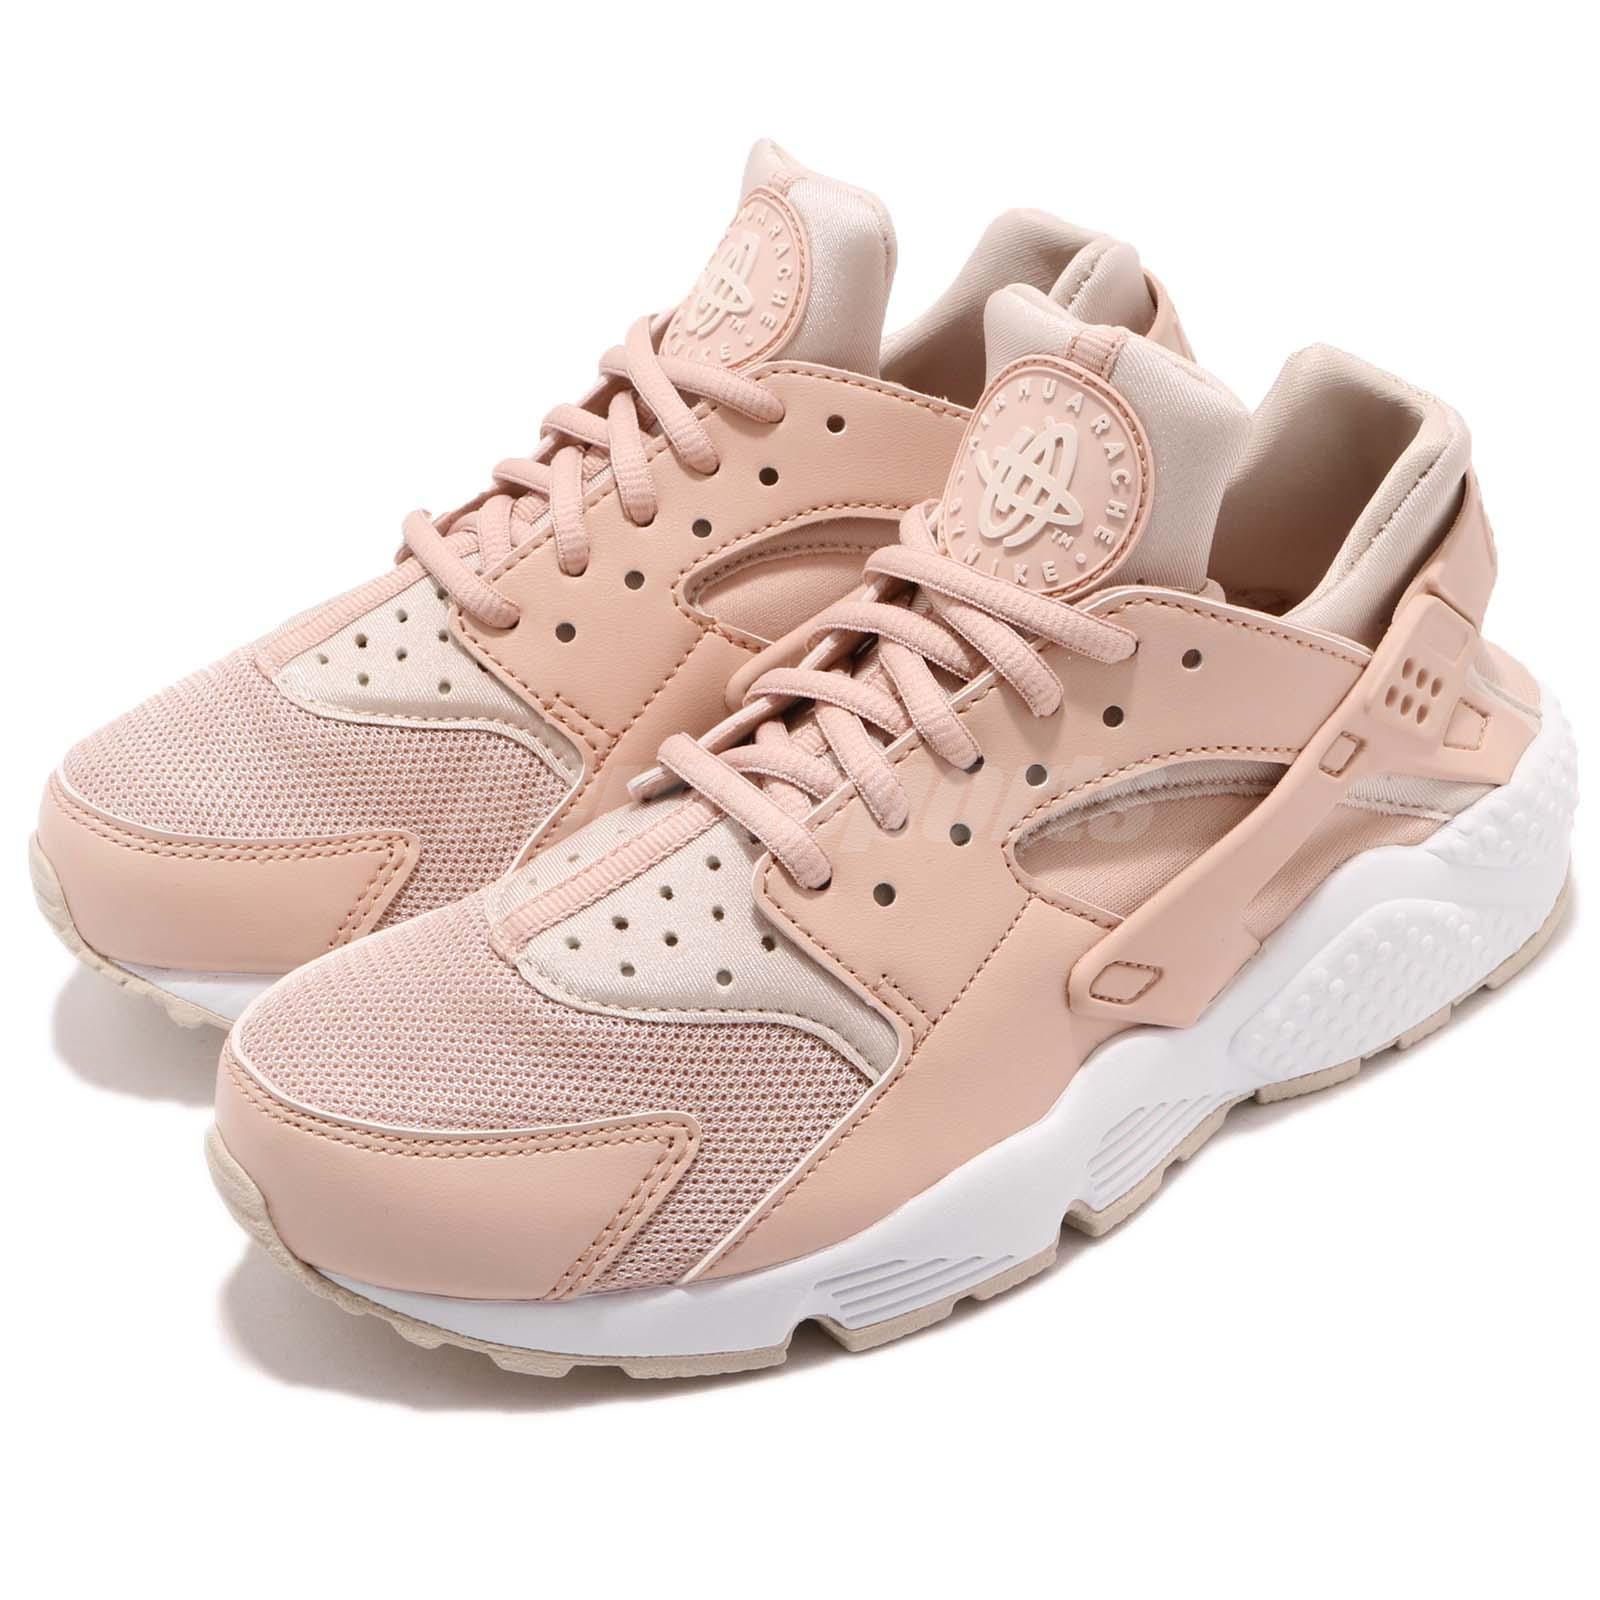 info for 103ec a61f1 Details about Nike Wmns Air Huarache Run Particle Beige Desert Sand Women  Shoes 634835-202